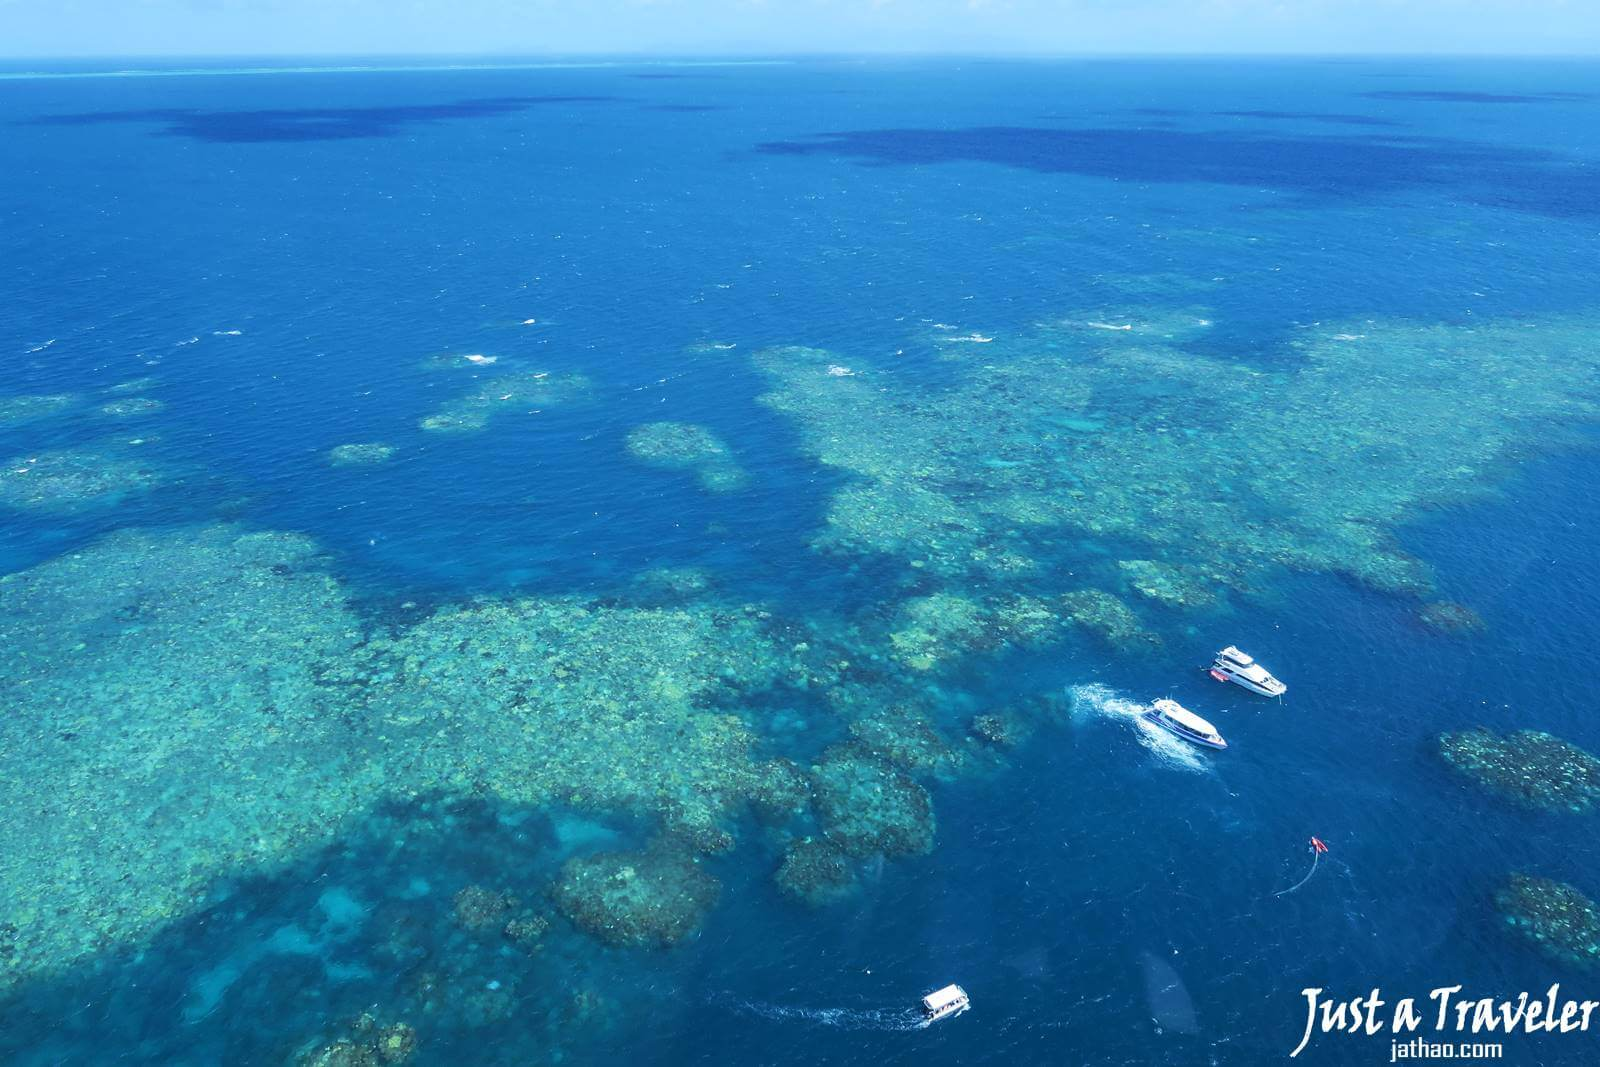 澳洲-凱恩斯-景點-交通-遊記-推薦-自由行-旅遊-大堡礁-美食-住宿-攻略-Australia-Cairns-Great-Barrier-Reef-Travel-Tourist-Attraction-Food-Transport